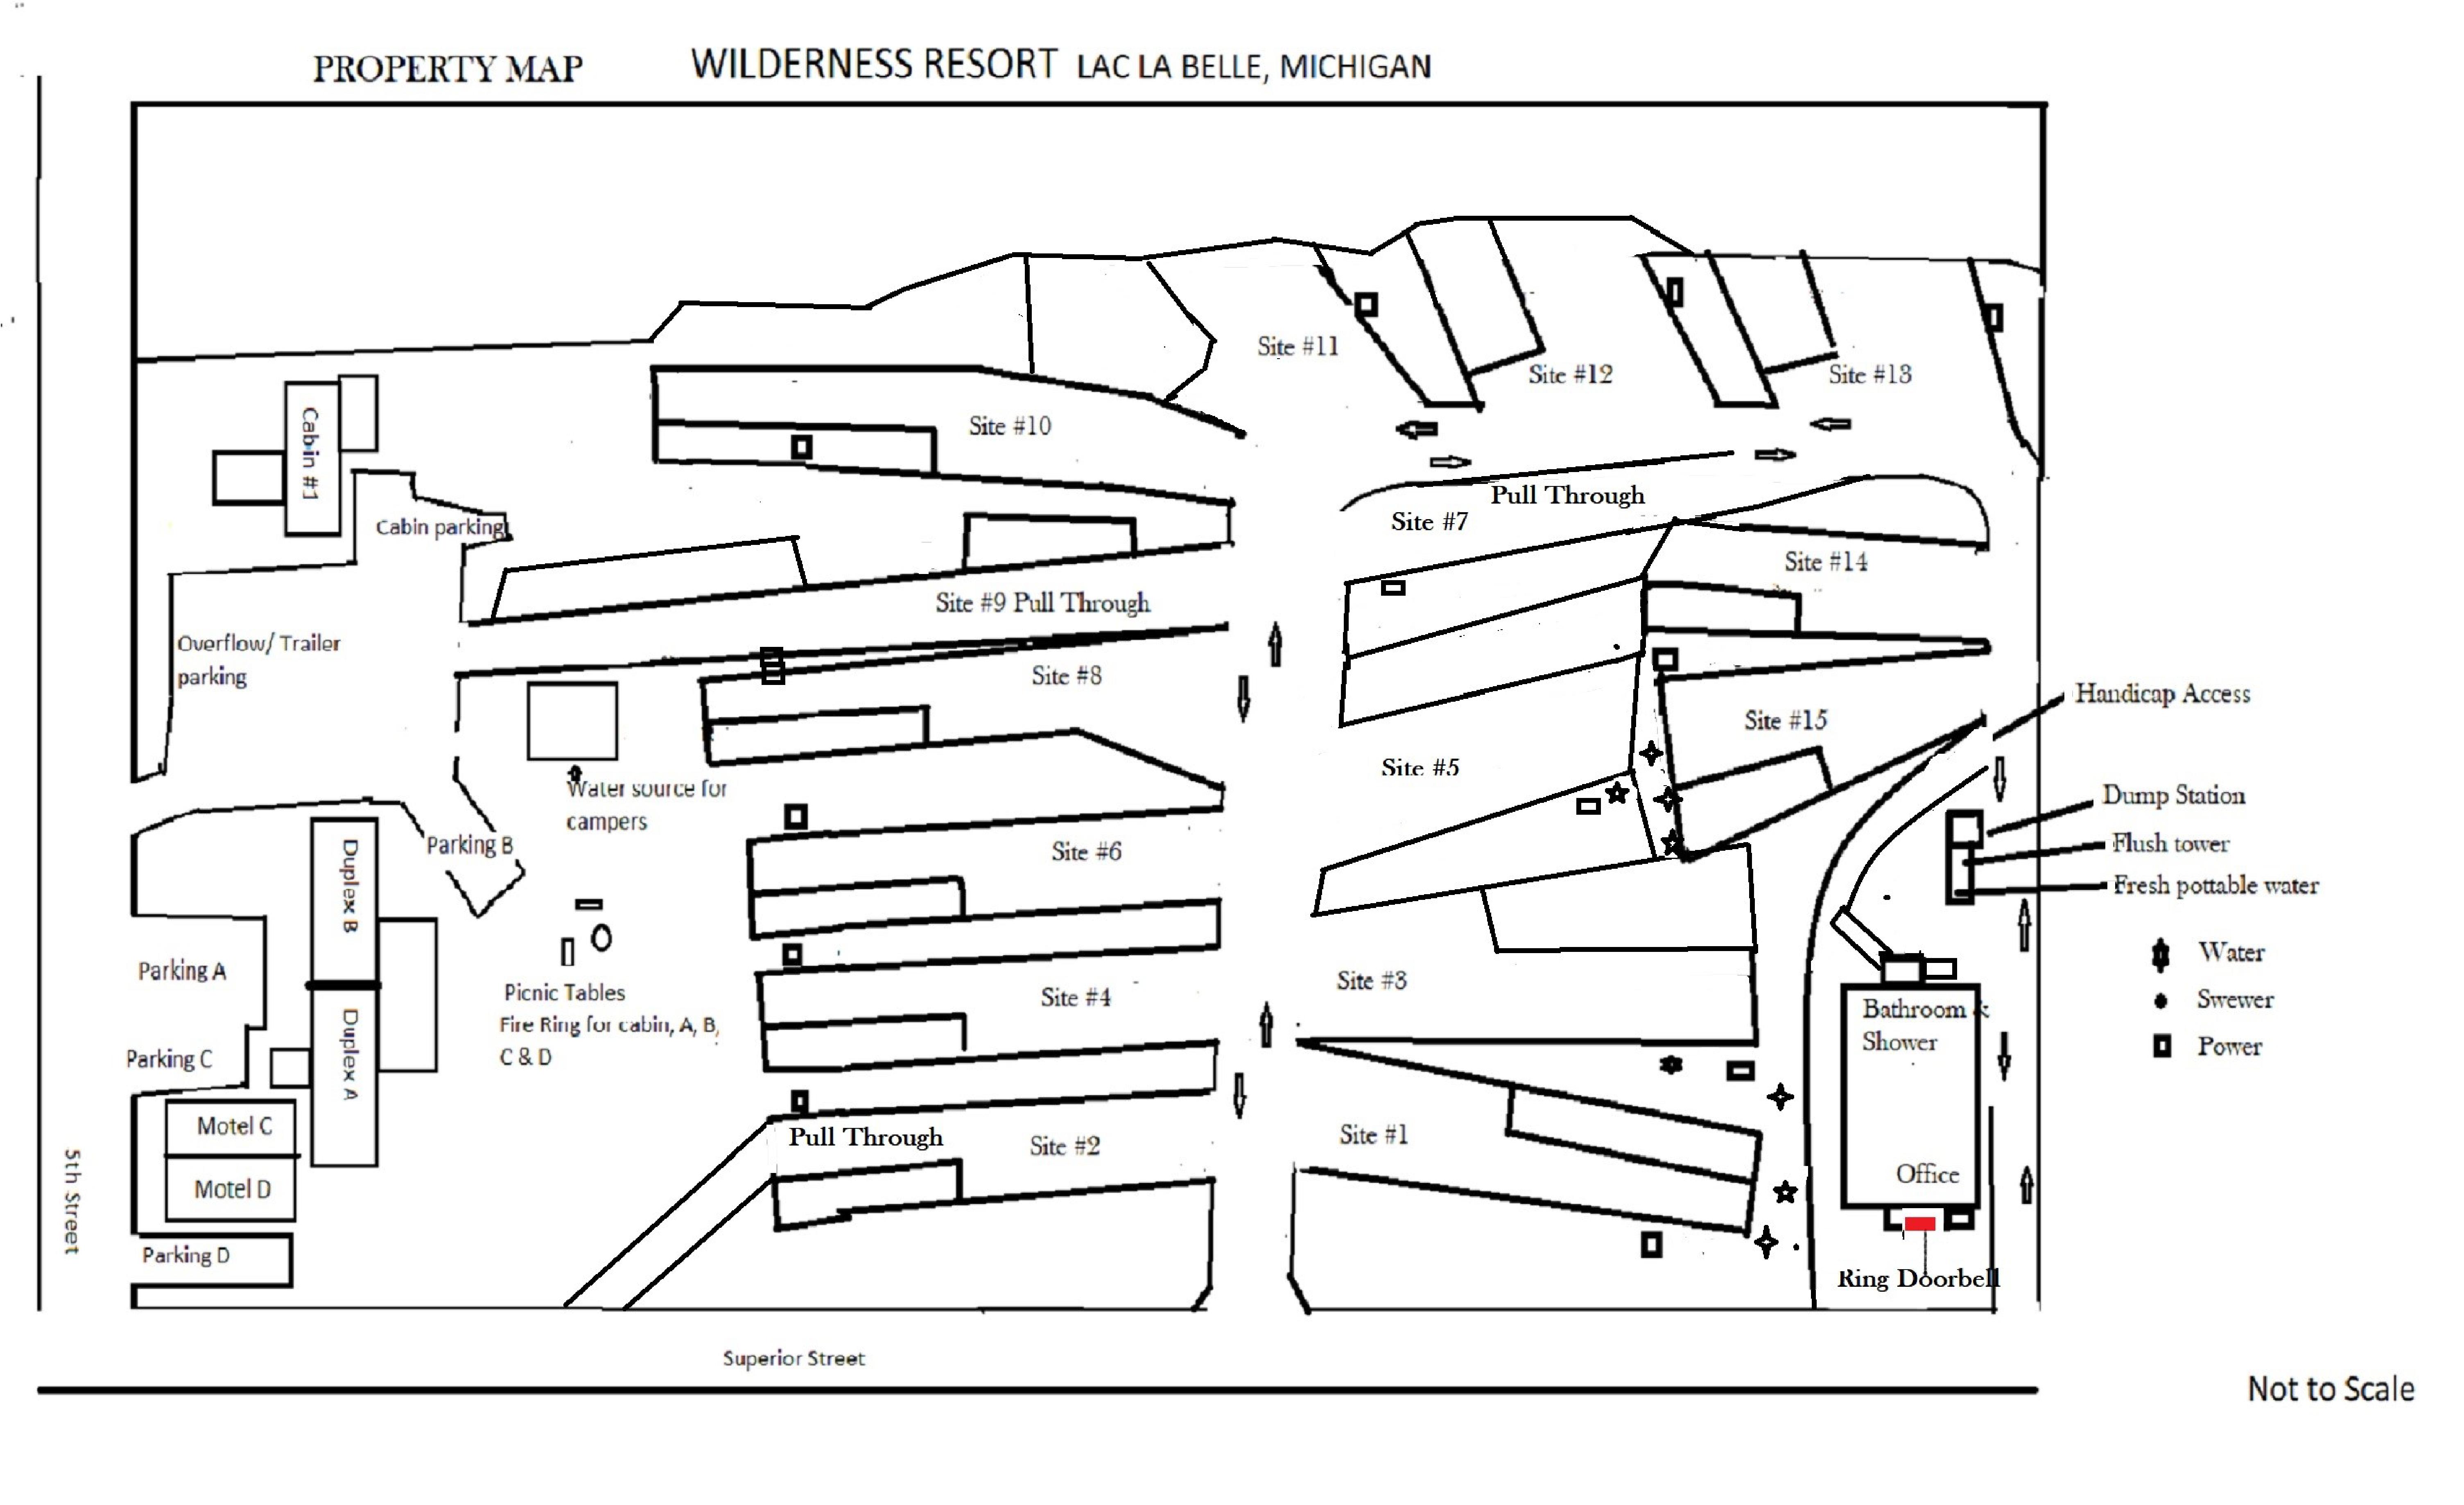 Wilderness Resort Property Map